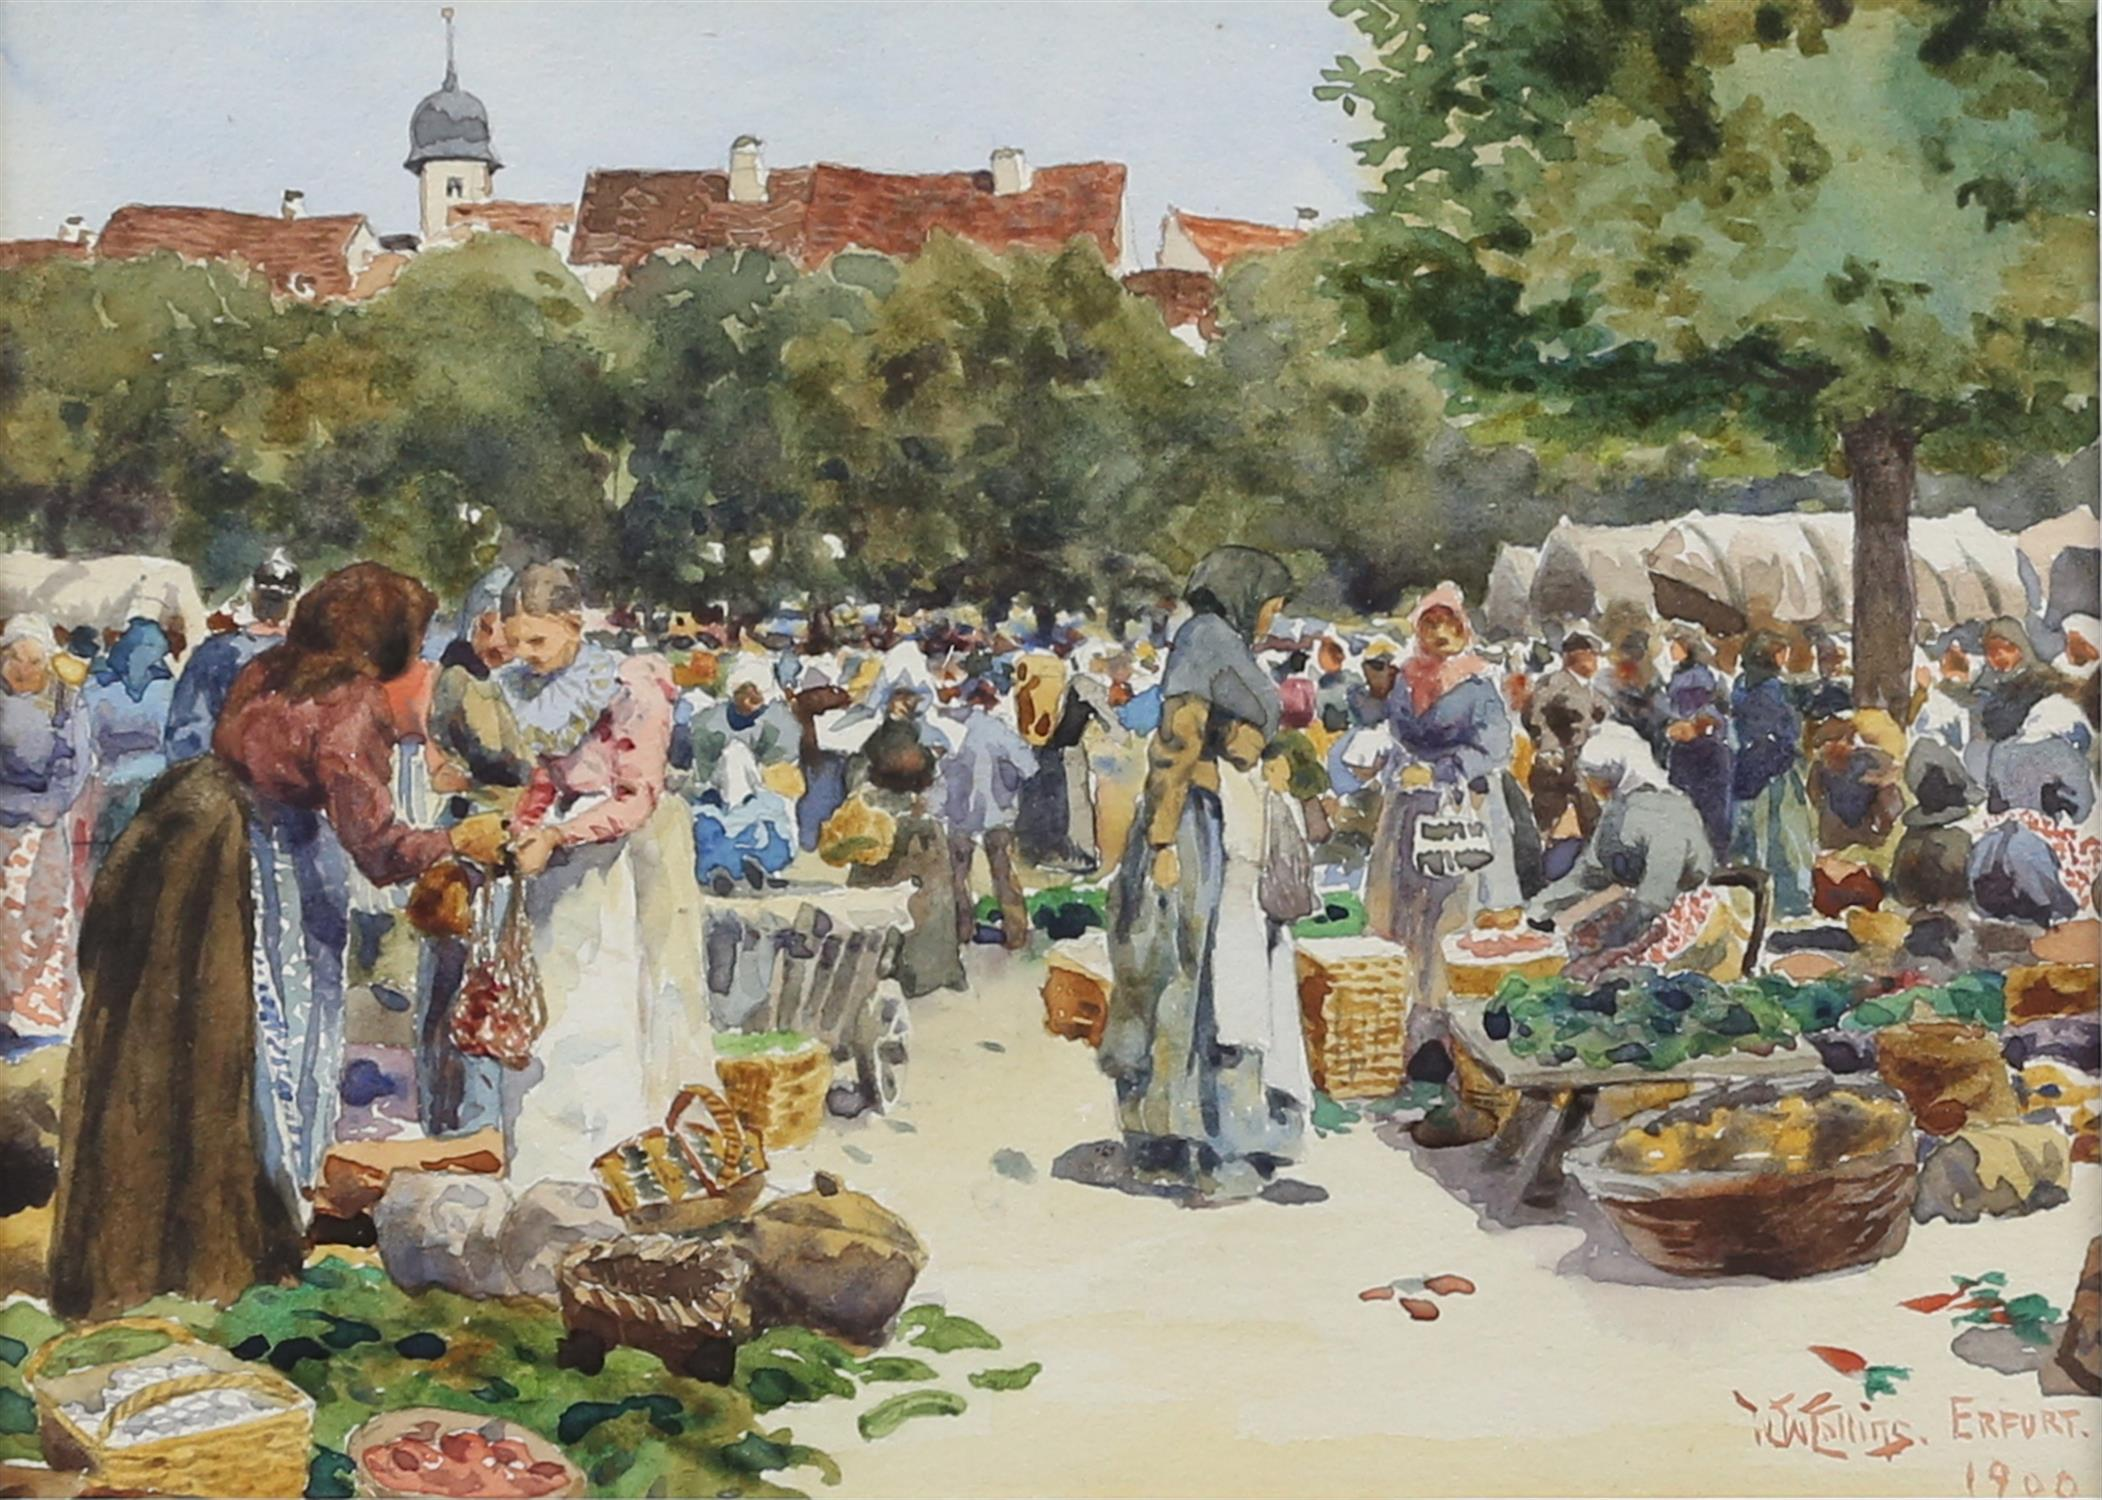 William Wiehe Collins, British 1862-1951, 'Erfurt', market scene, signed and dated 1900,